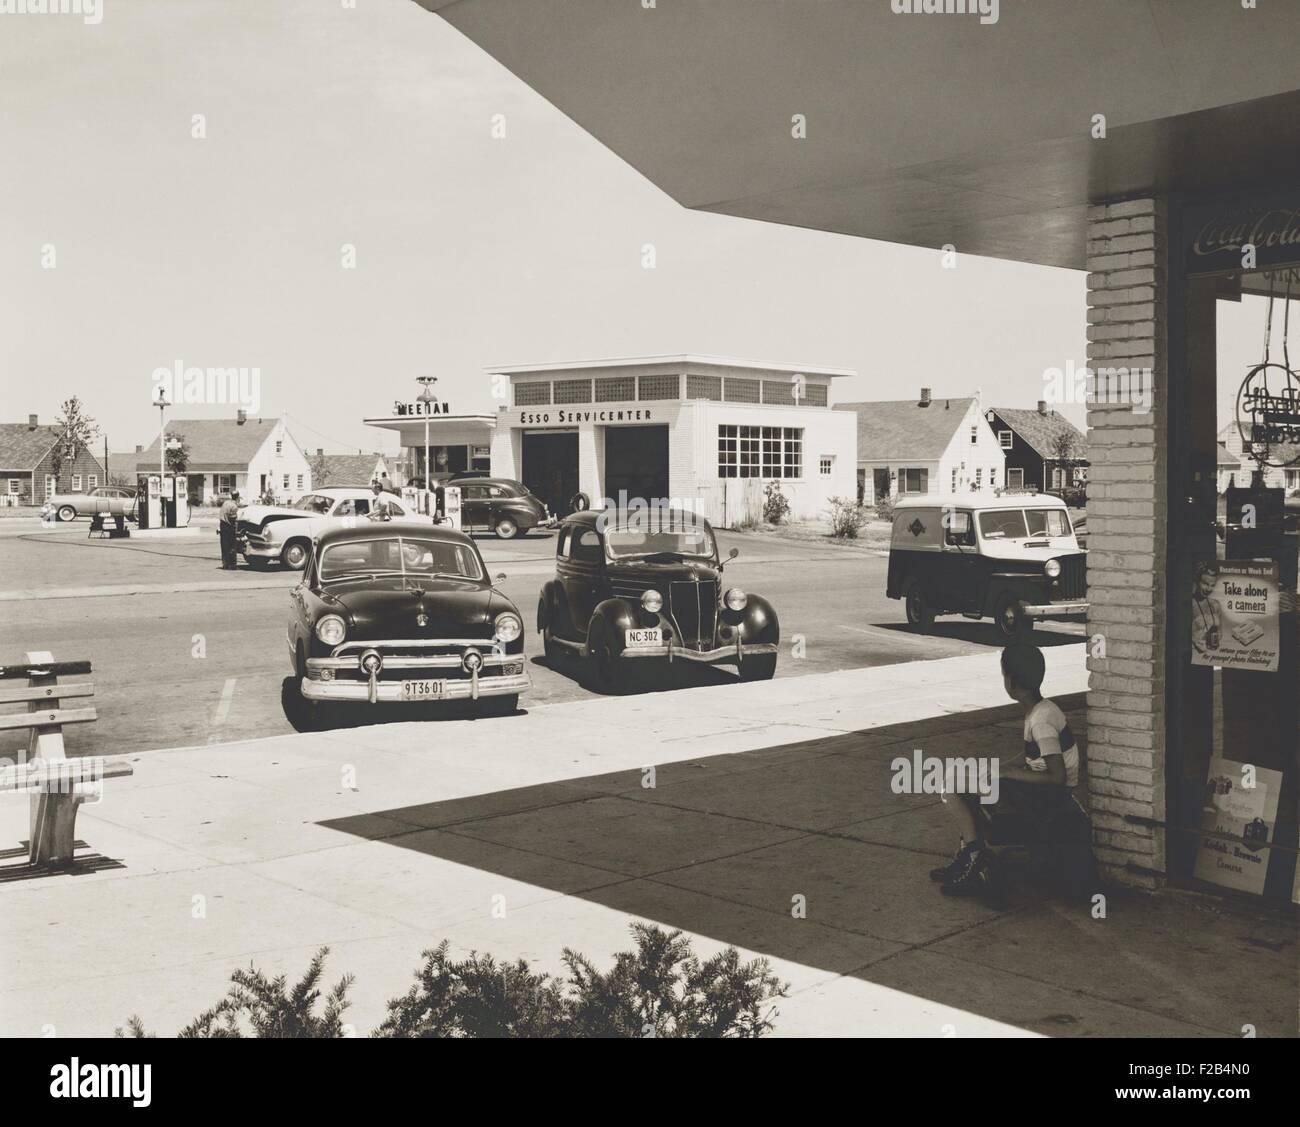 Levittown Stock Photos & Levittown Stock Images - Alamy